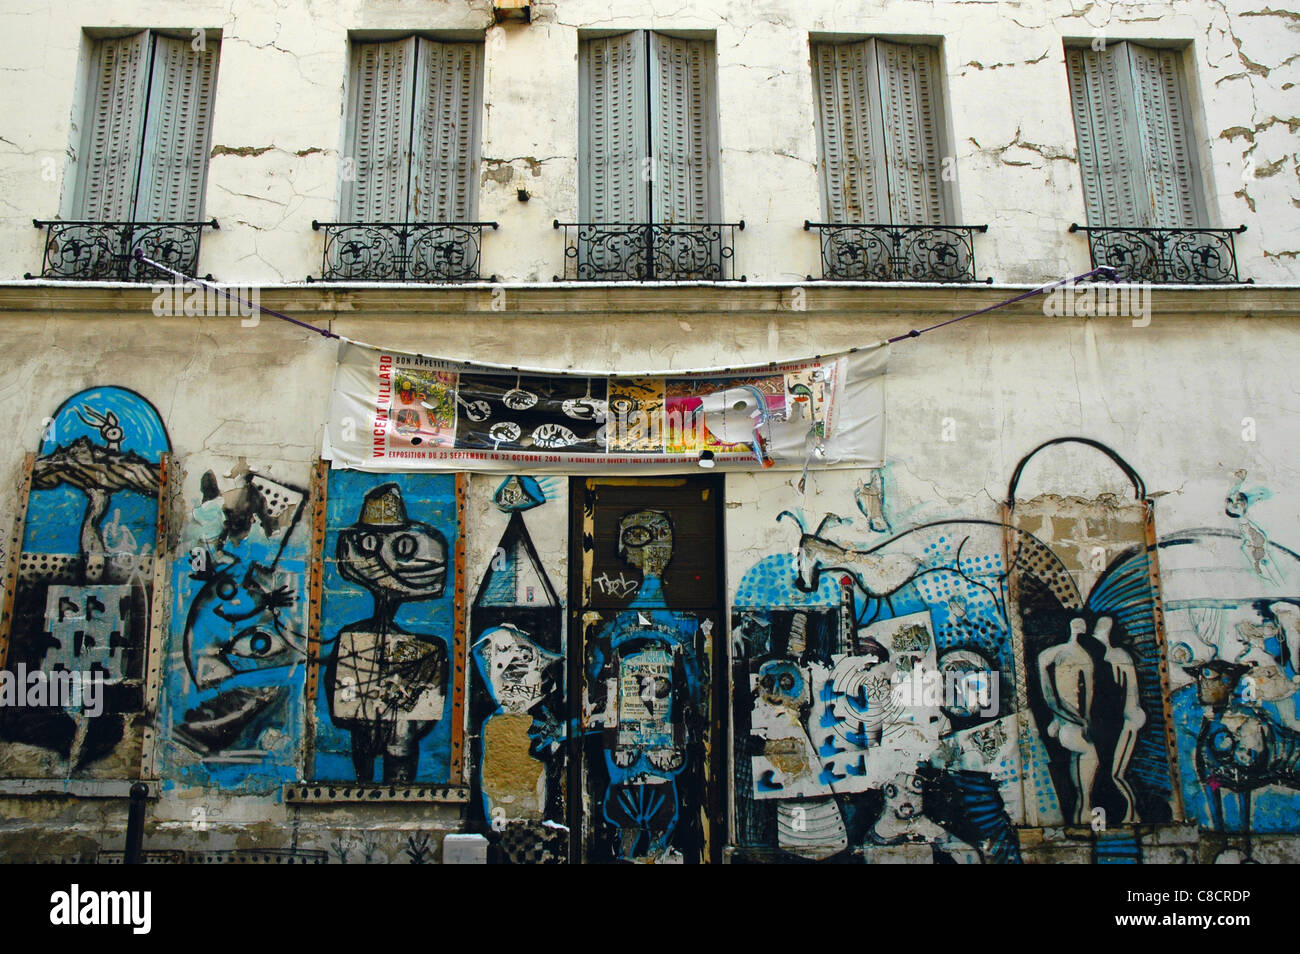 Street art in paris stock photo royalty free image 39619826 alamy - Expo street art paris ...